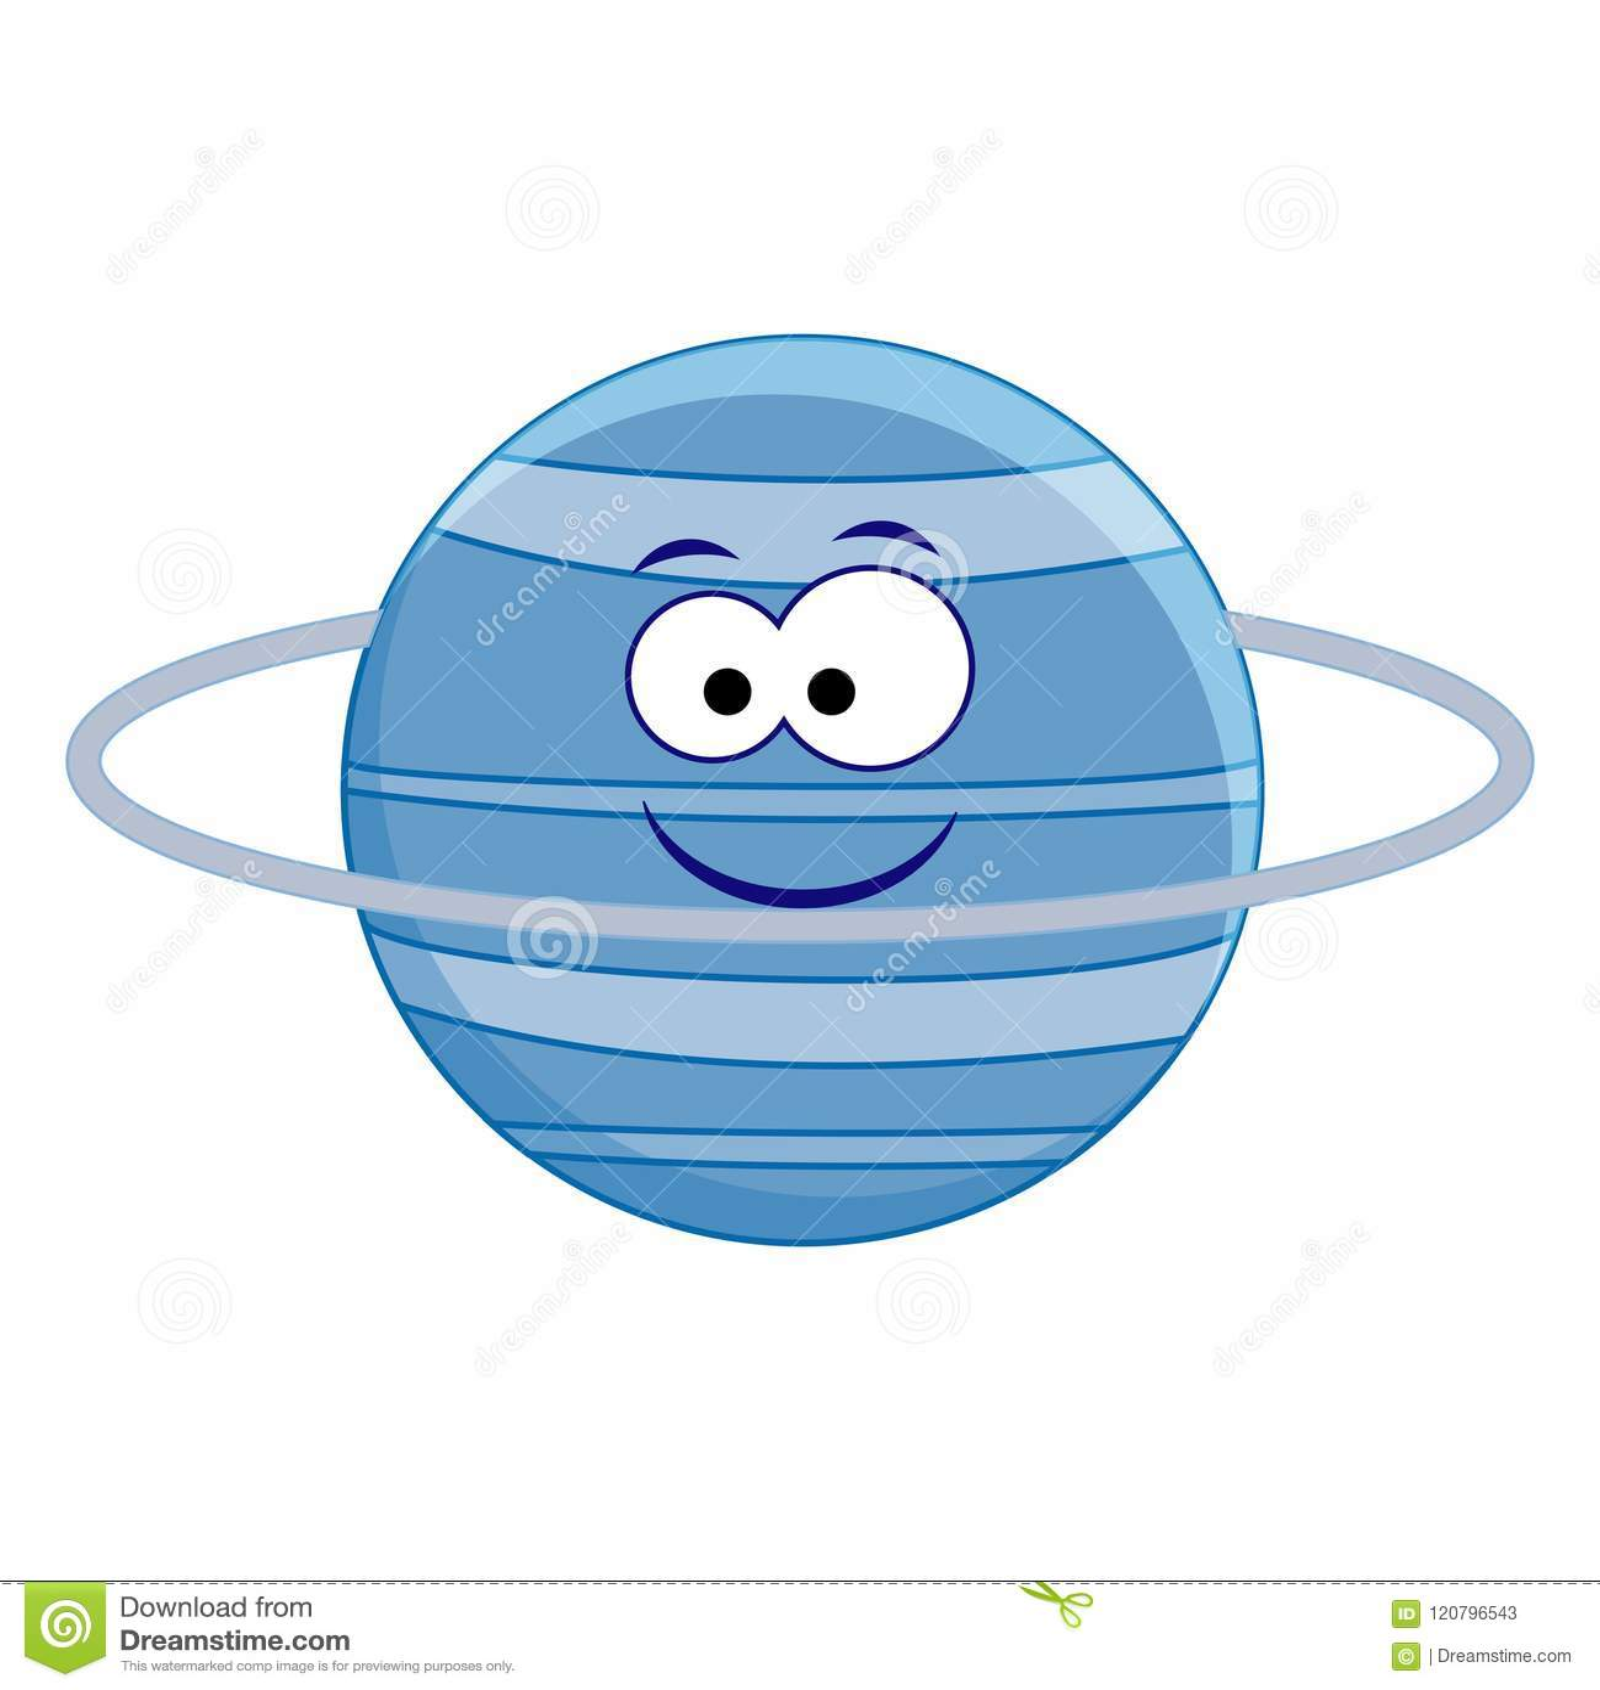 hight resolution of cute cartoon uranus planet vector illustration isolated on whi